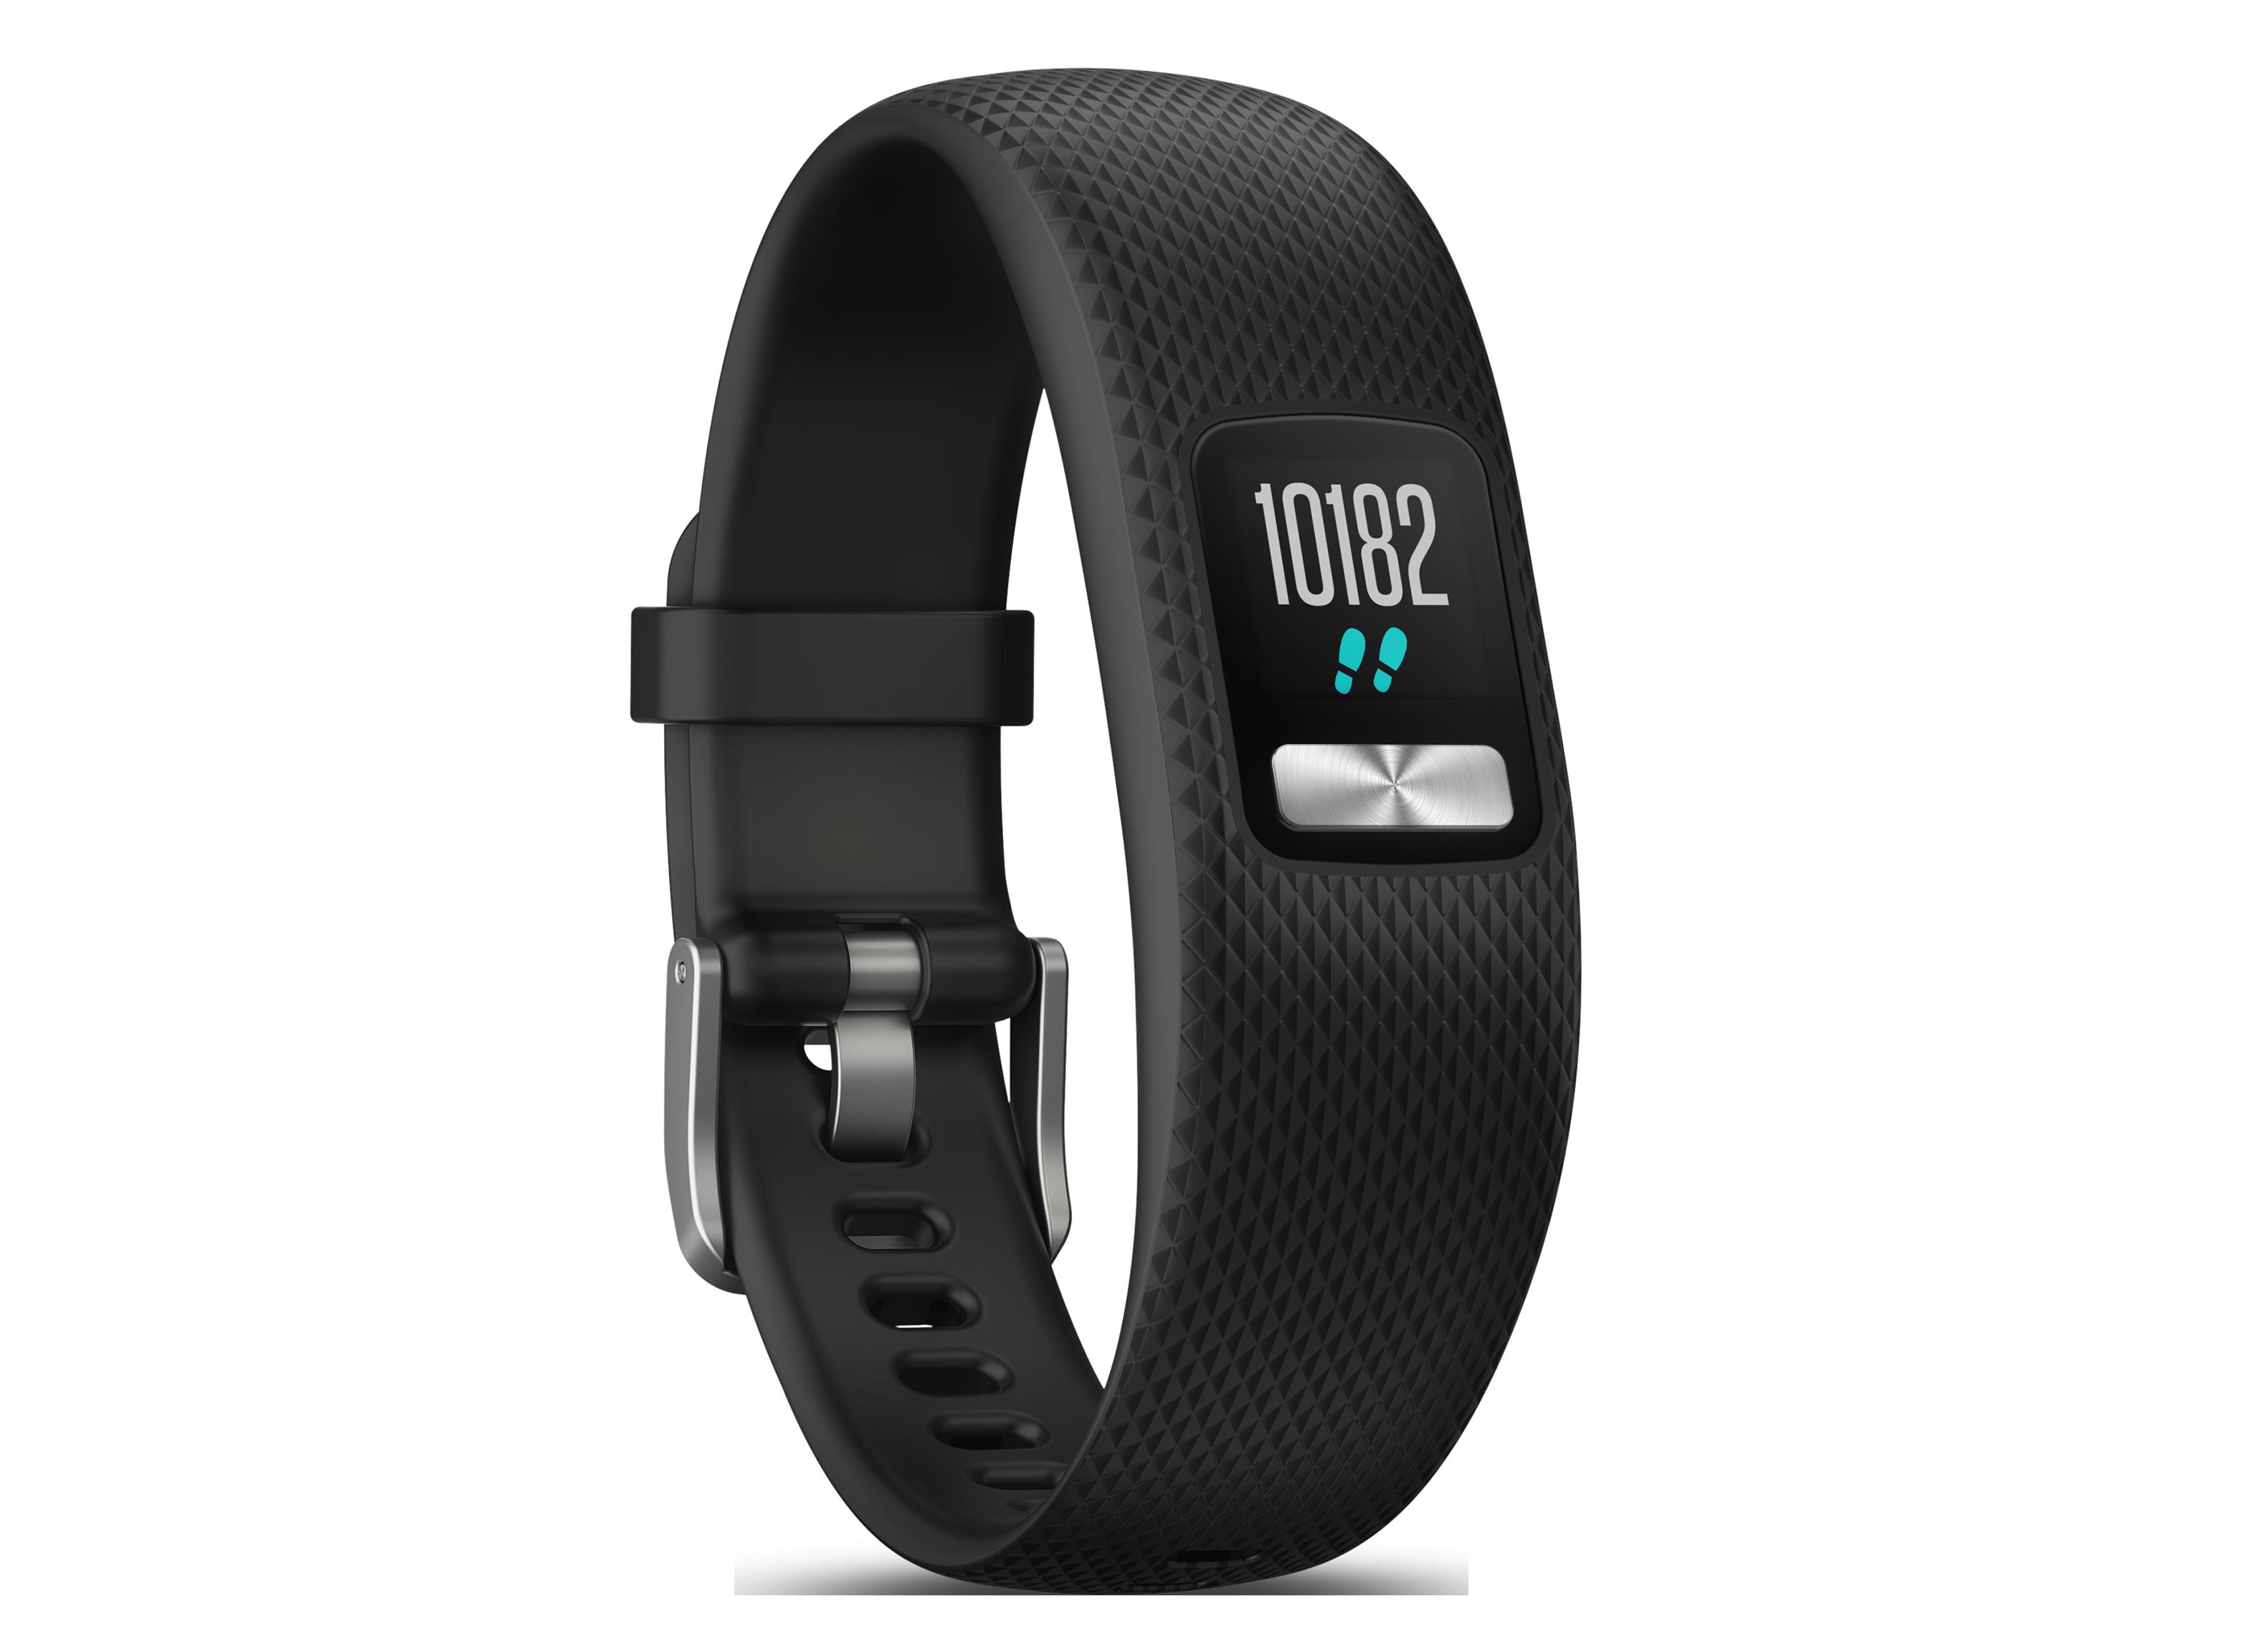 Vivitar Vfit 5 in 1 Fitness Tracker - Consumer Reports